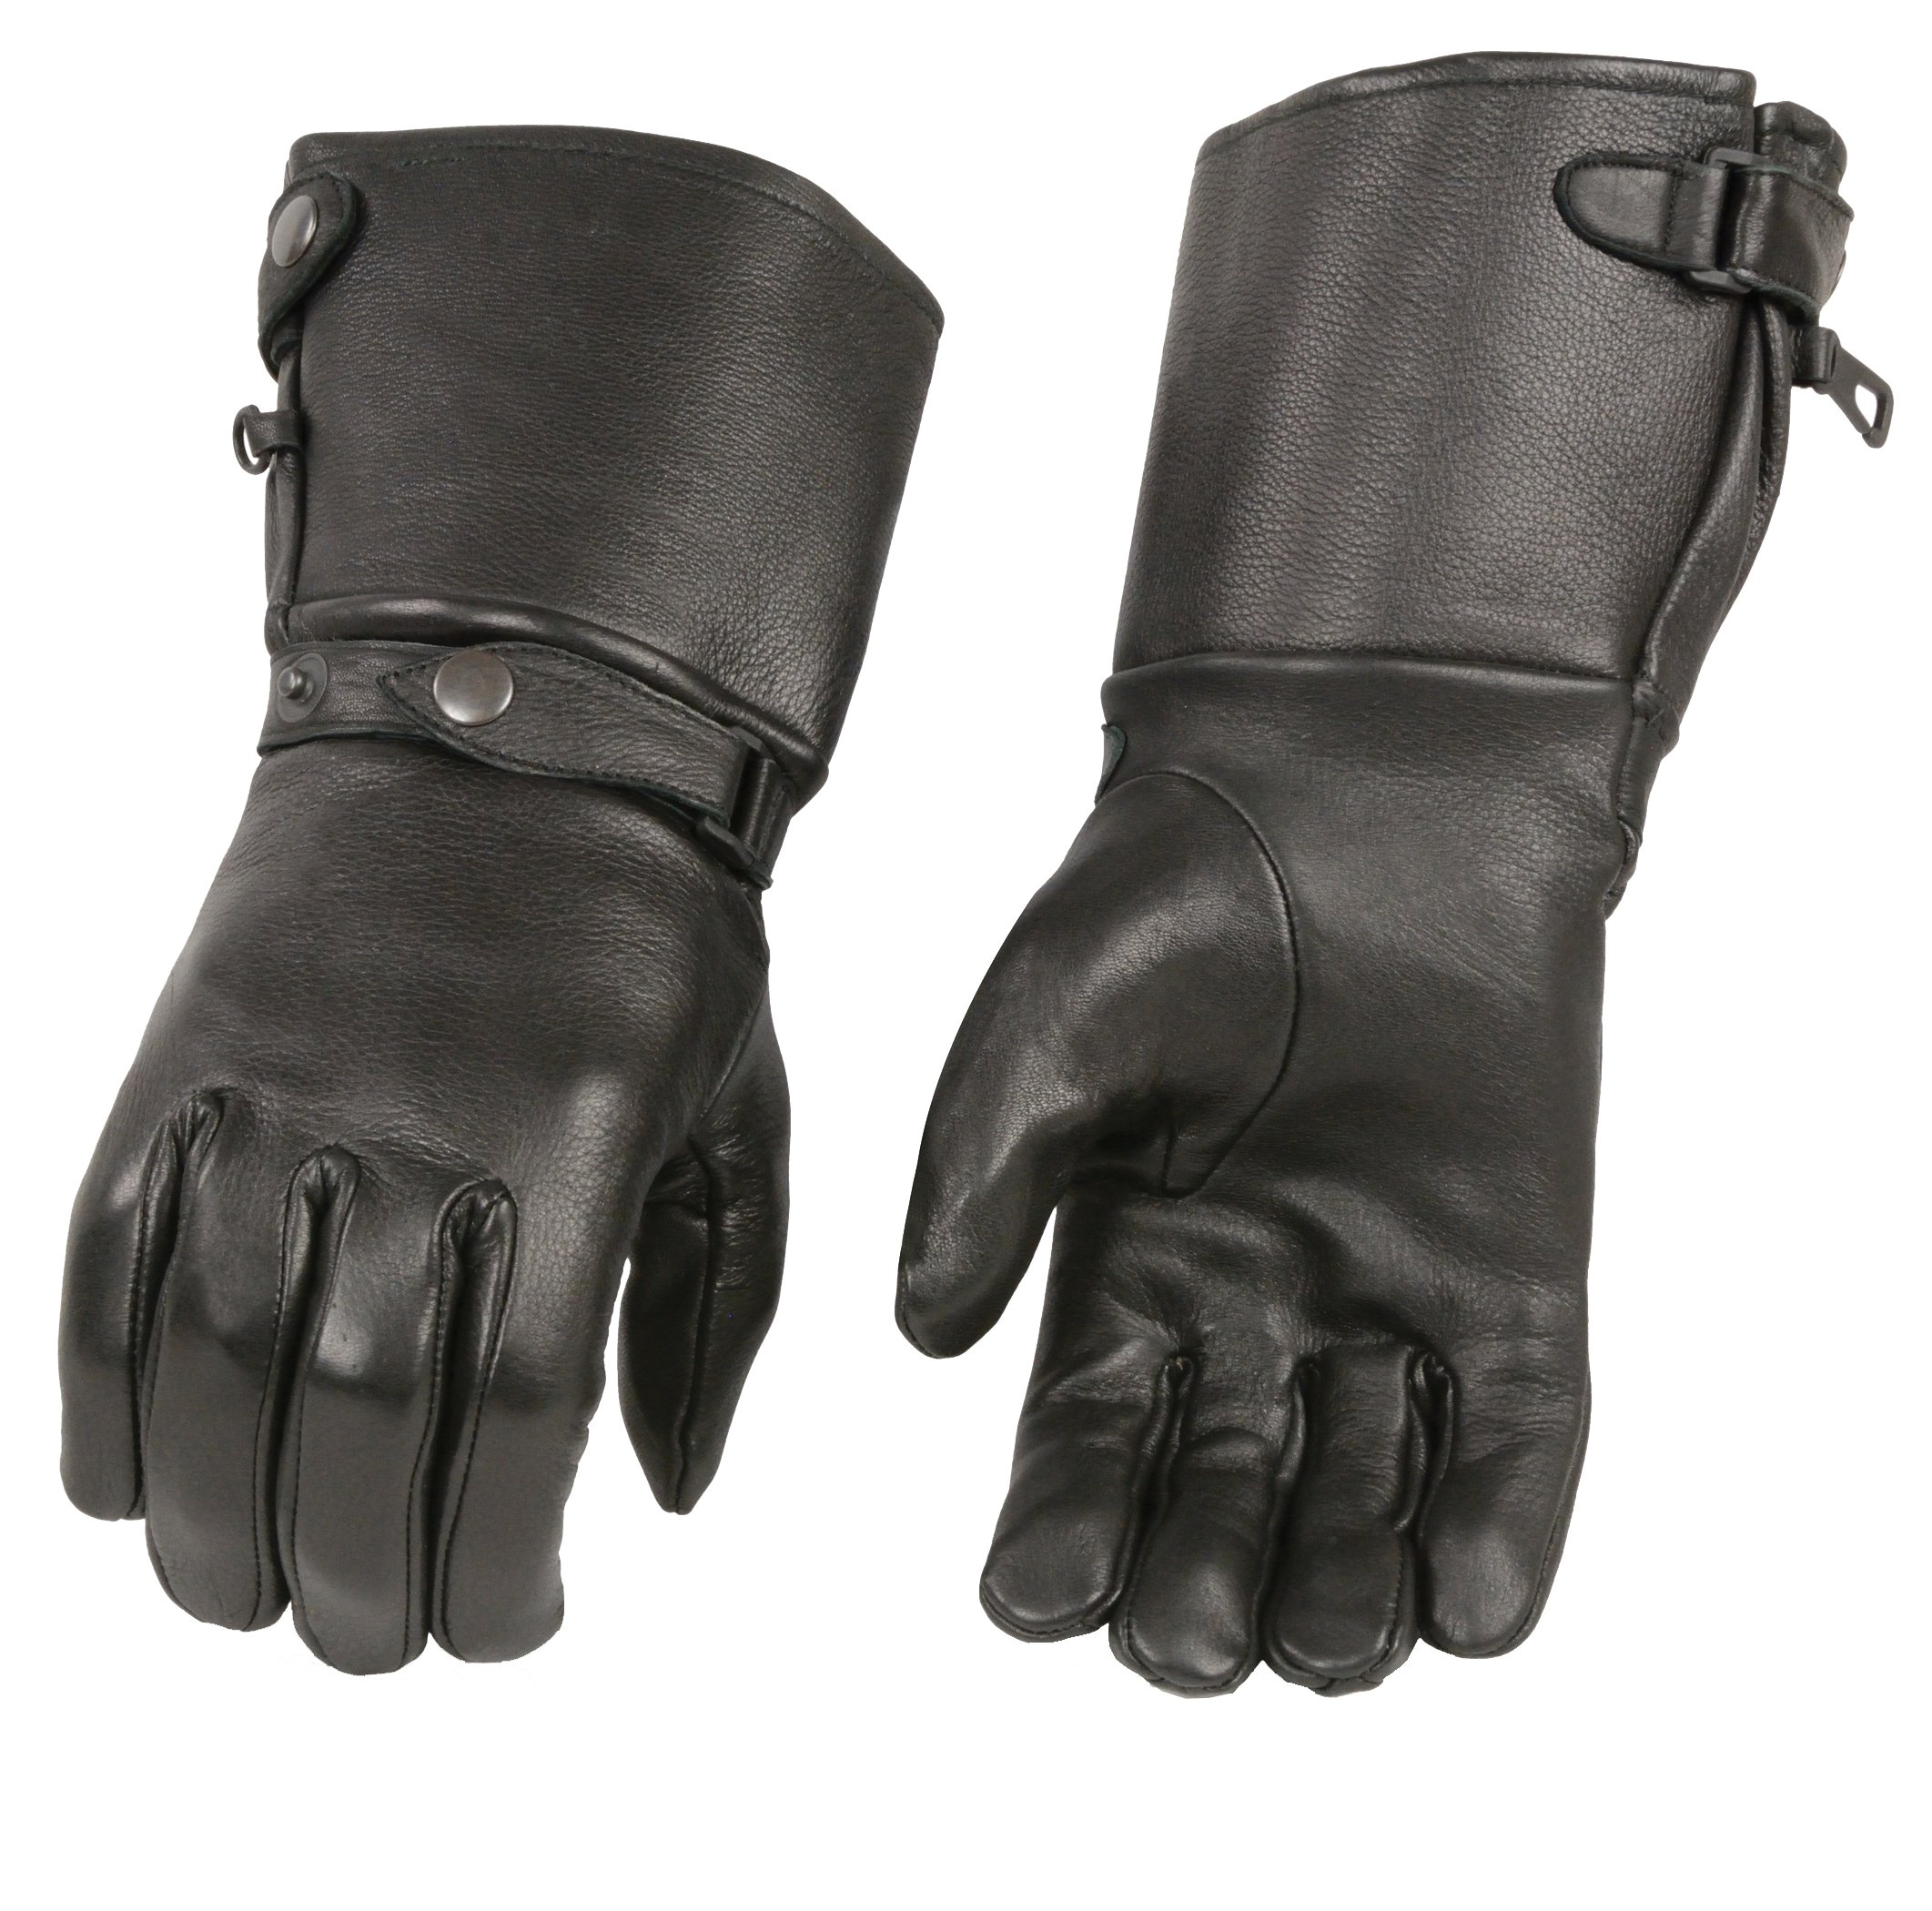 M-BOSS APPAREL-Men's USA Deerskin Thermal Lined Gauntlet Gloves w Snap Wrist & Cuff-Black-L